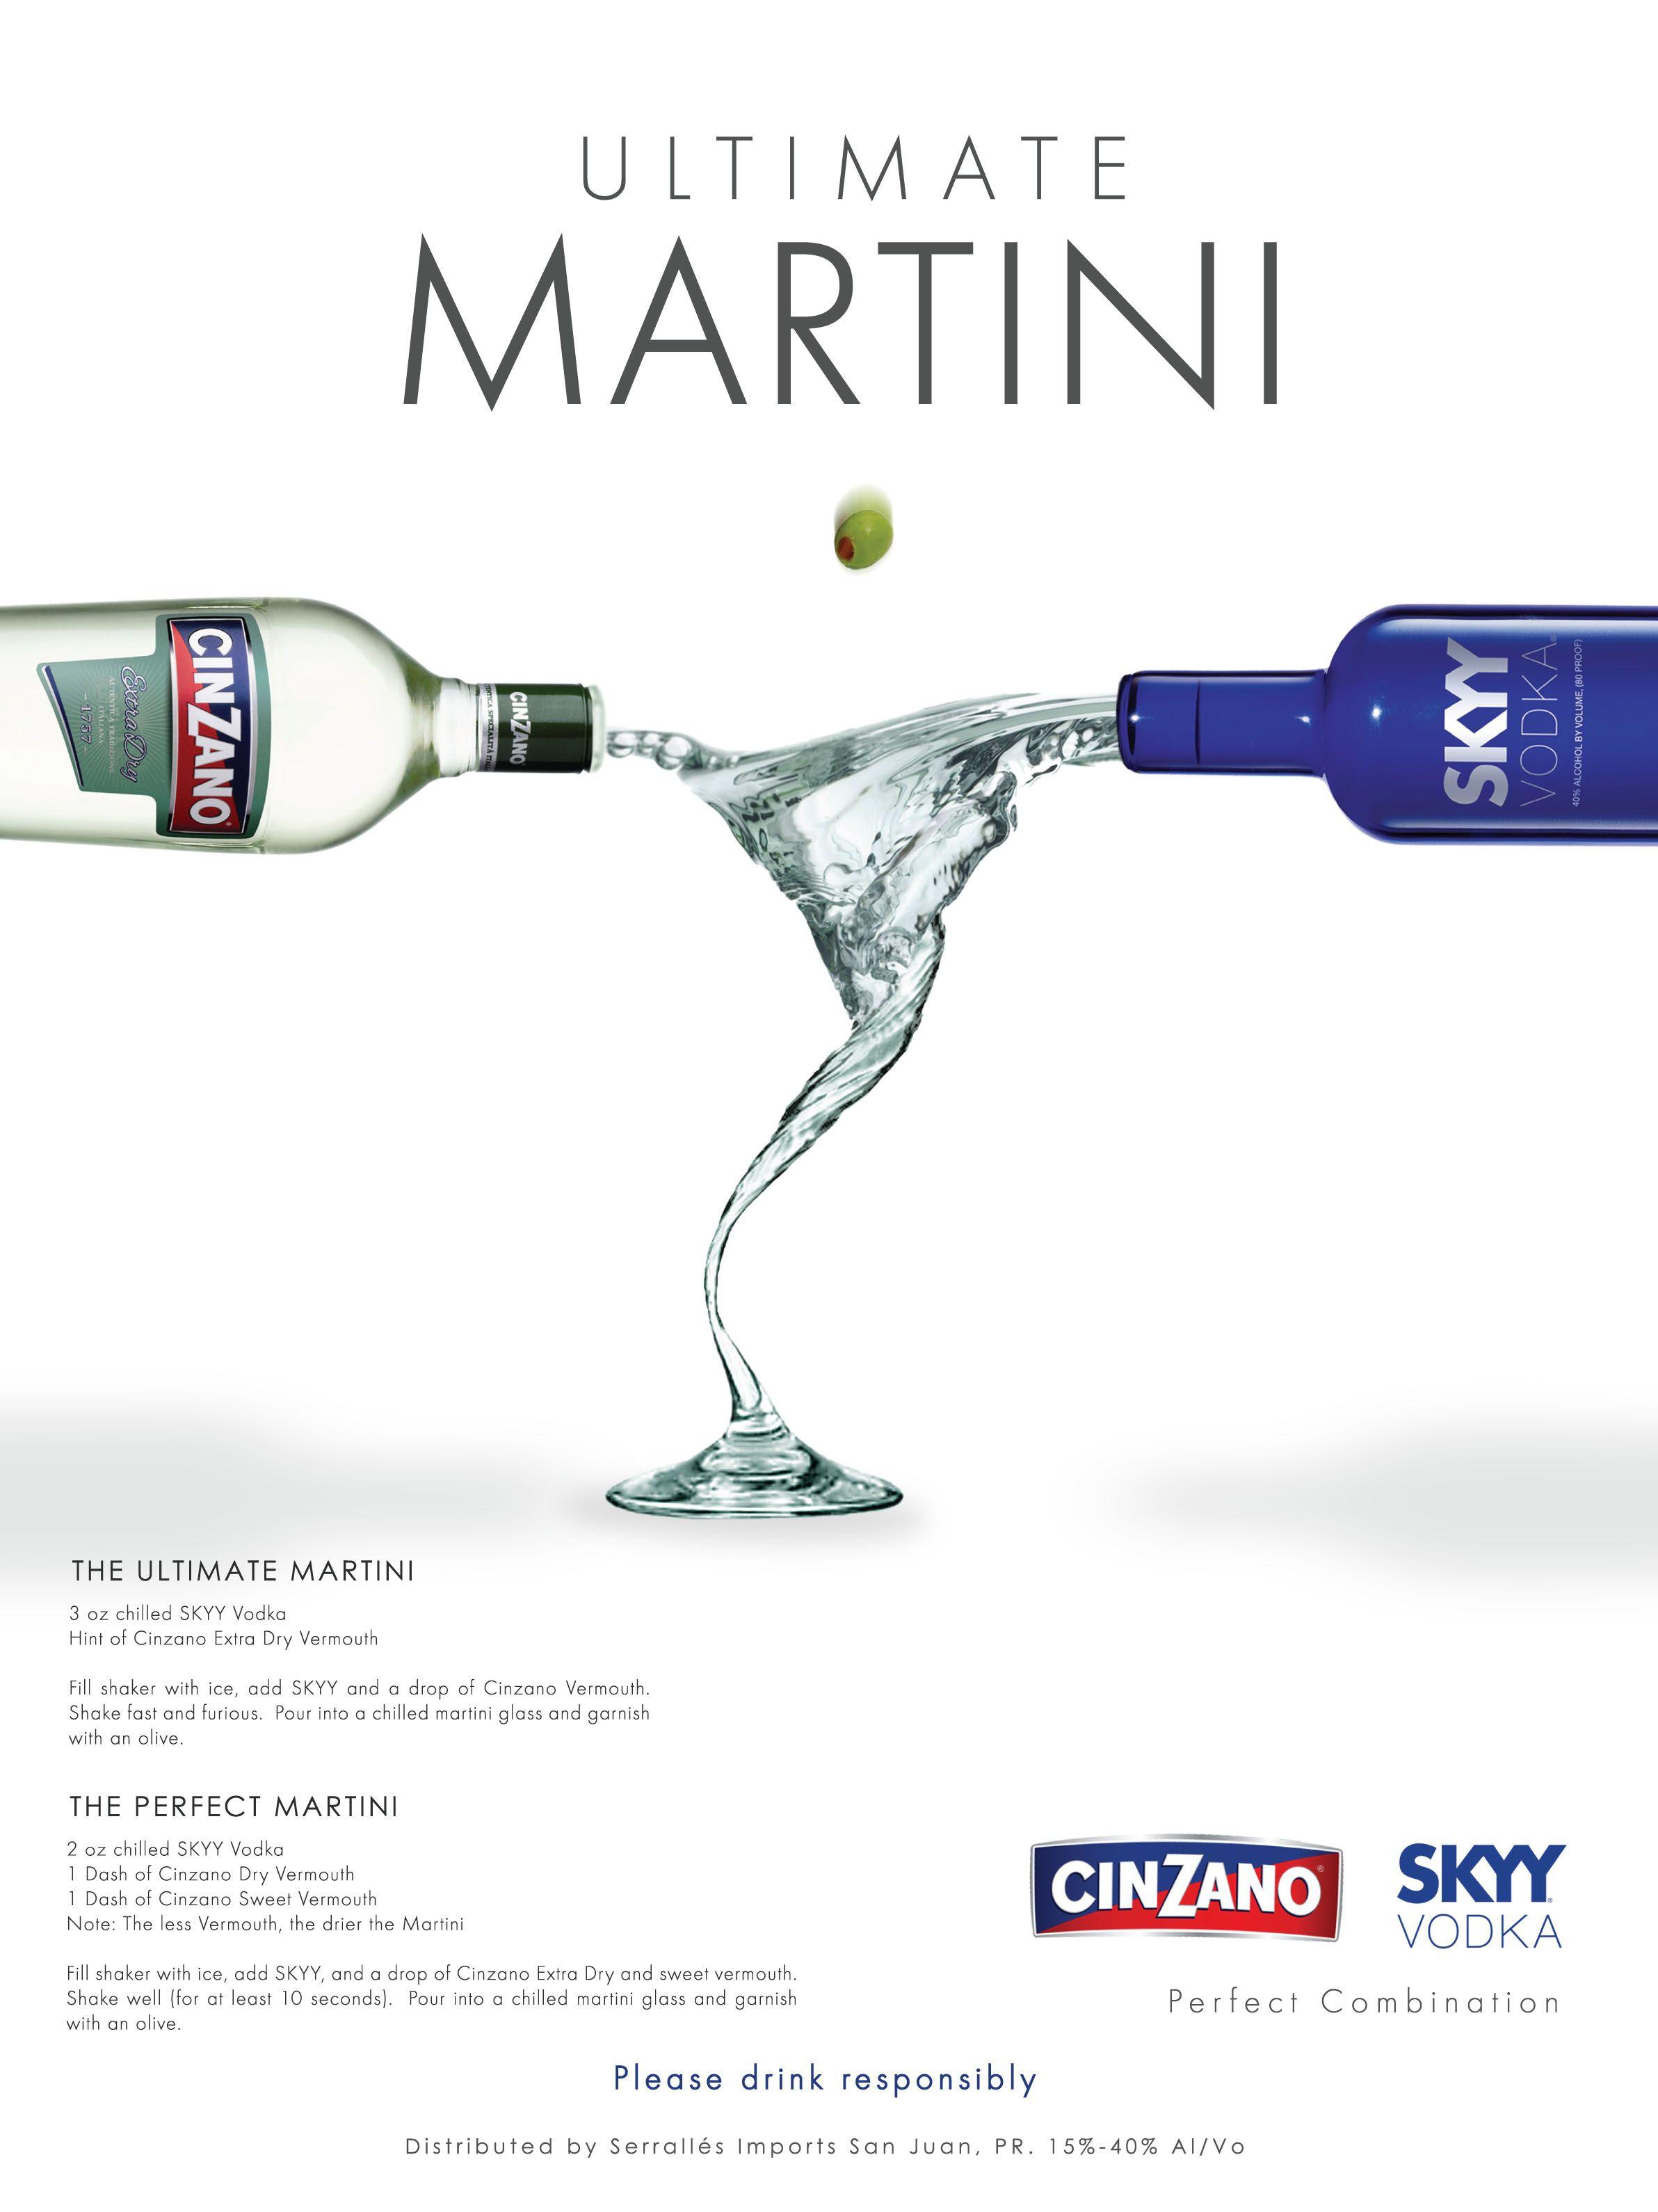 Skyy Vodka and Cinzano Vermouth AD